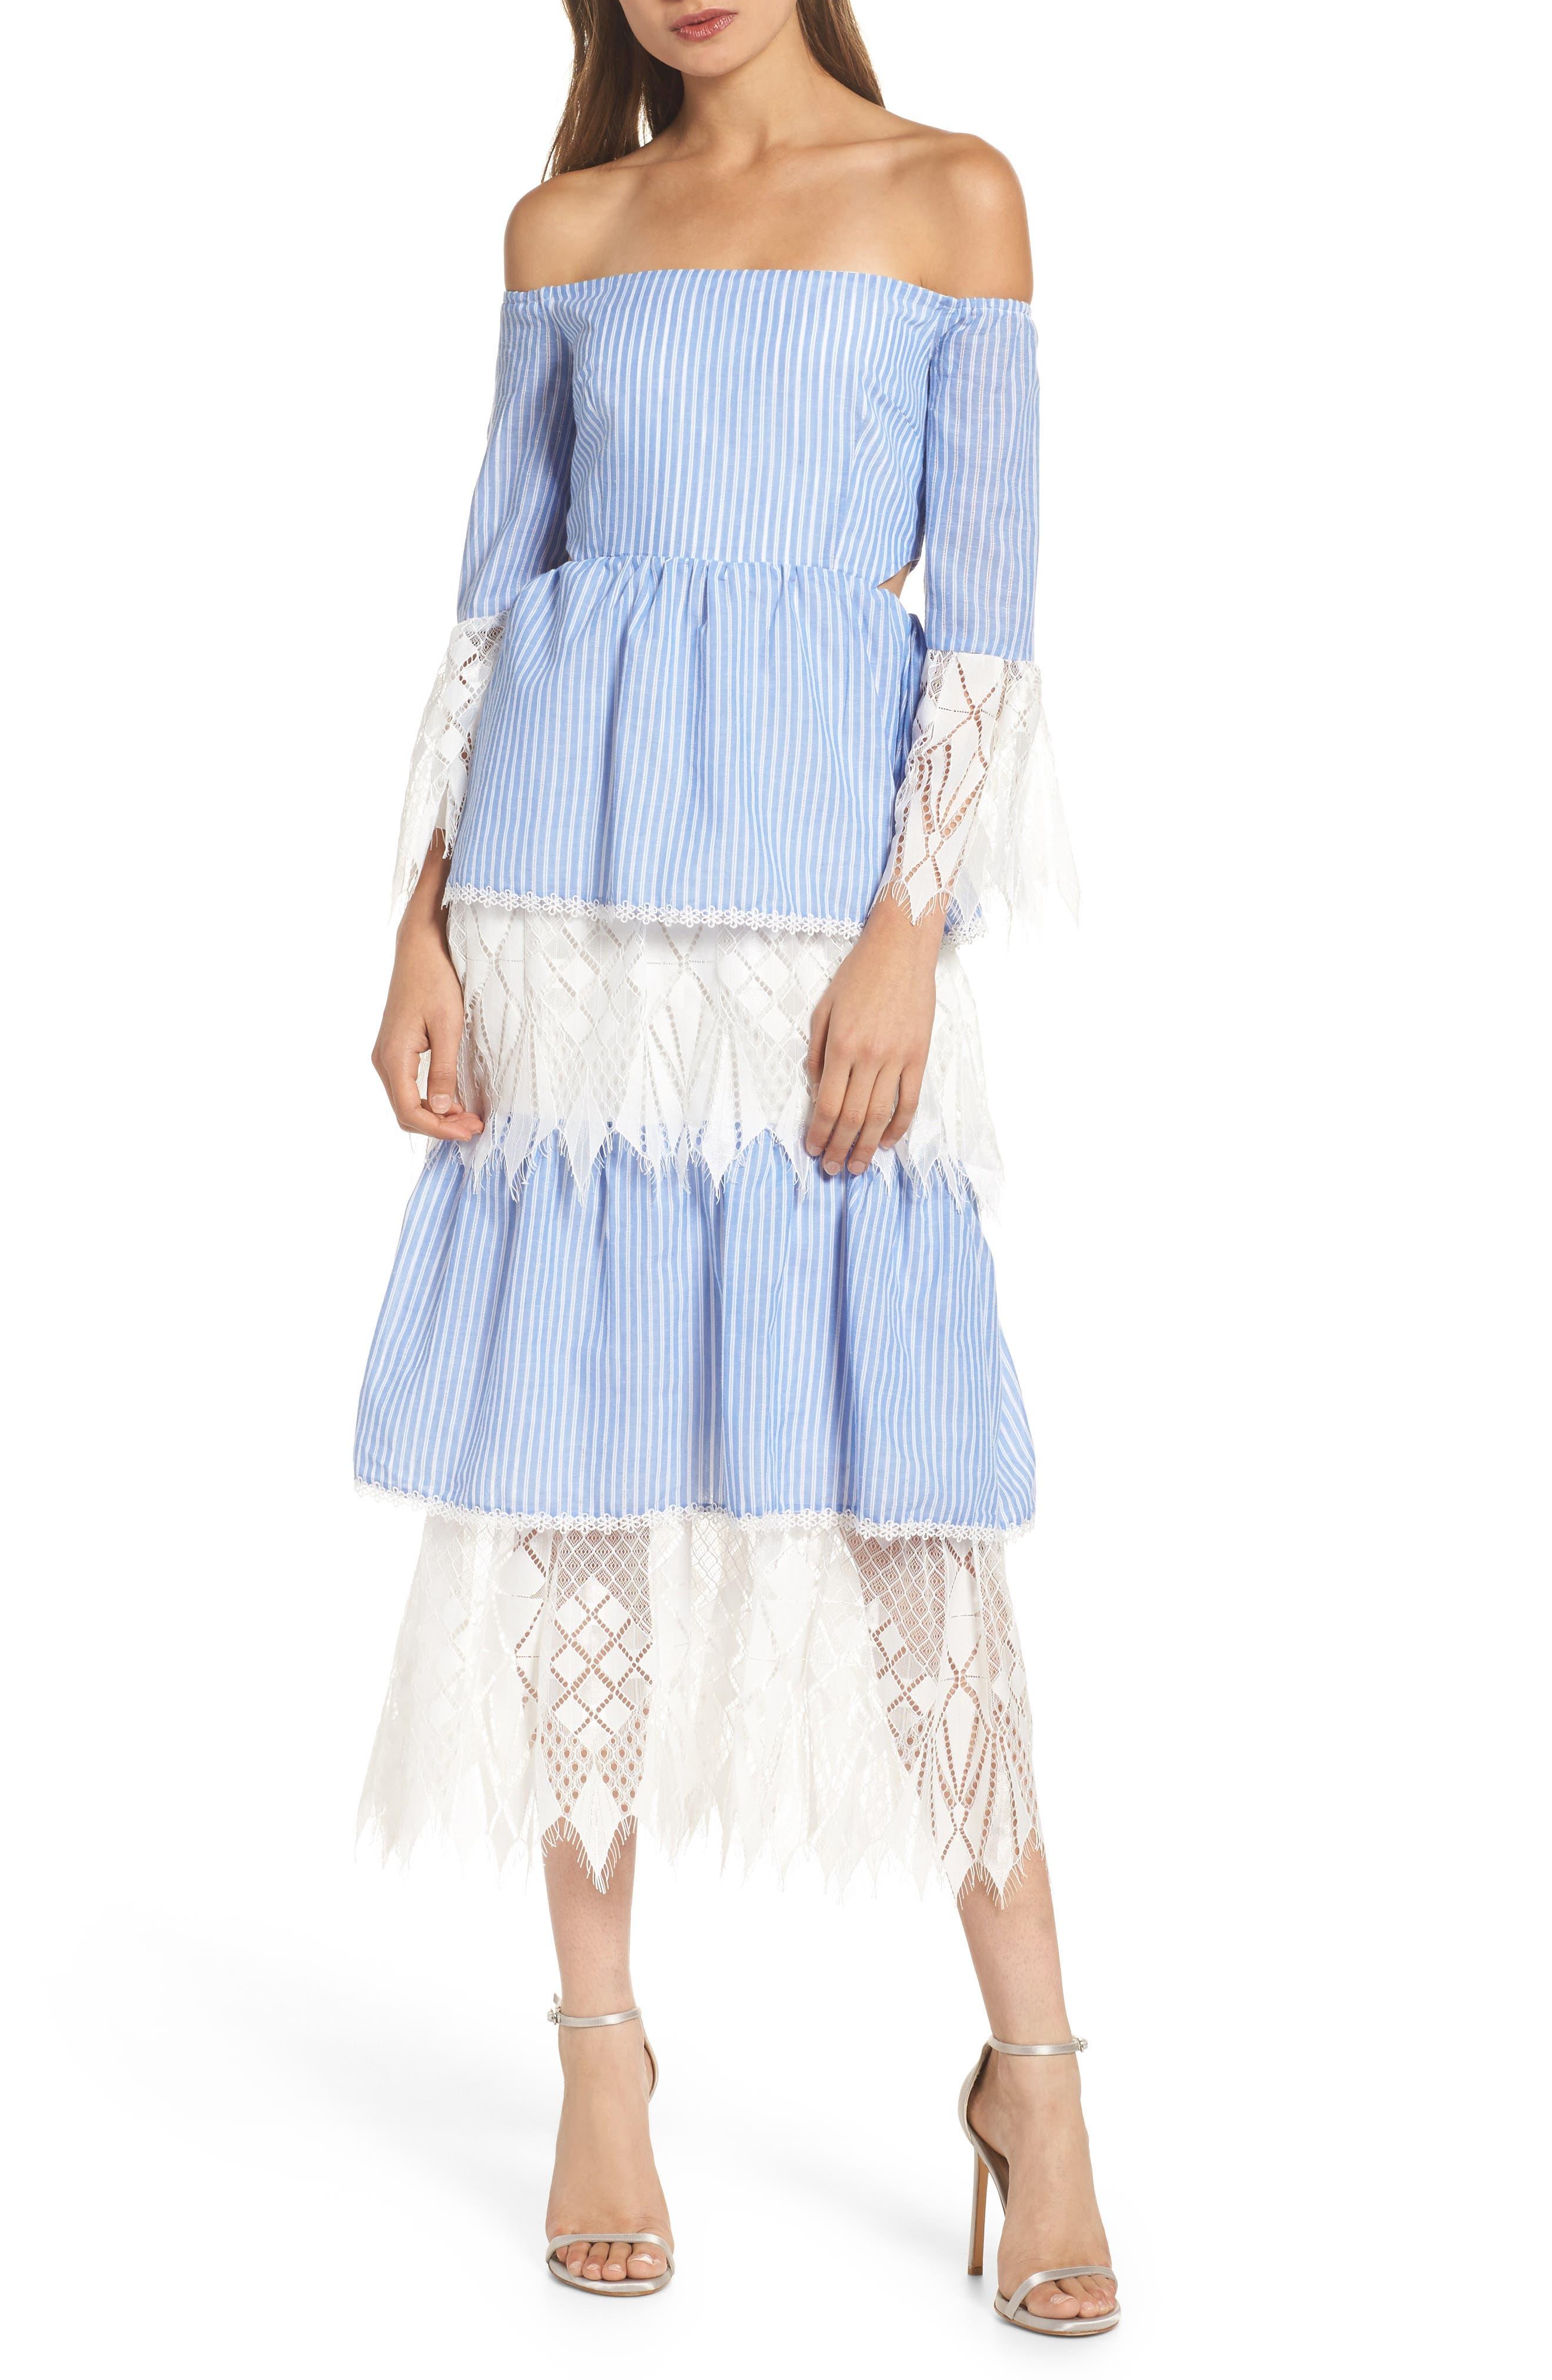 Addison Lace Tier Off the Shoulder Midi Dress,                         Main,                         color, 434